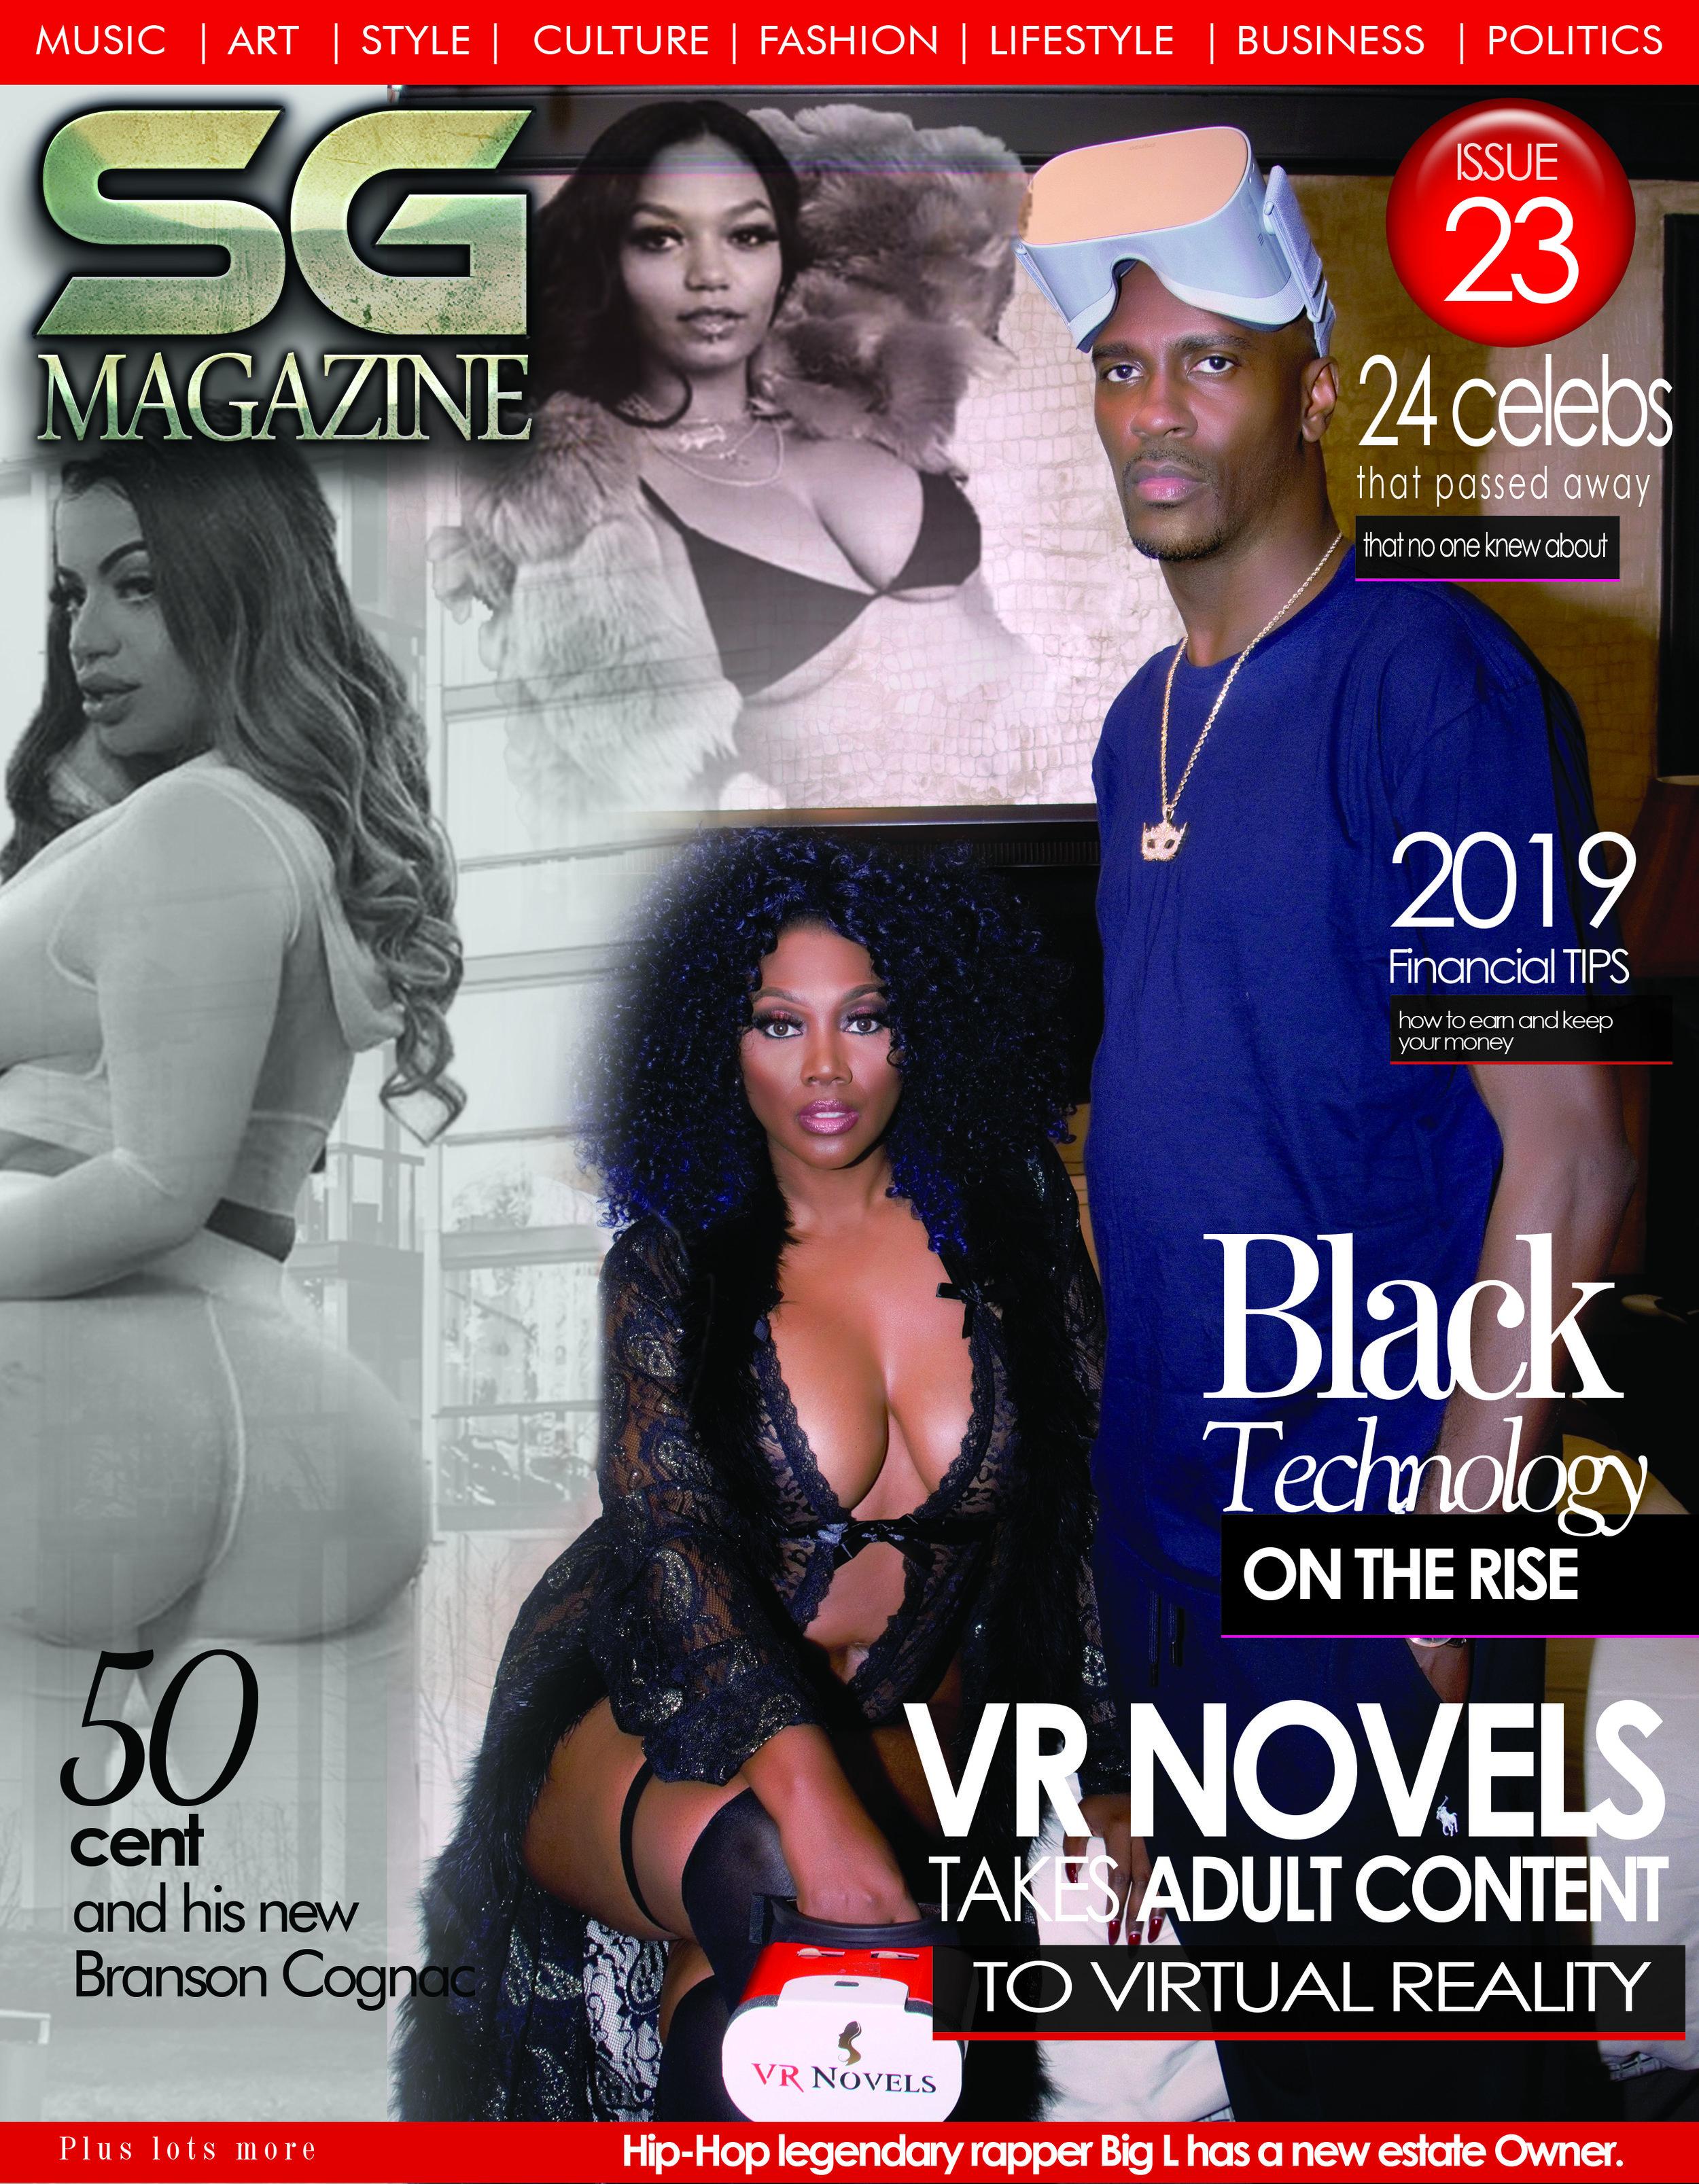 SG Magazine #23